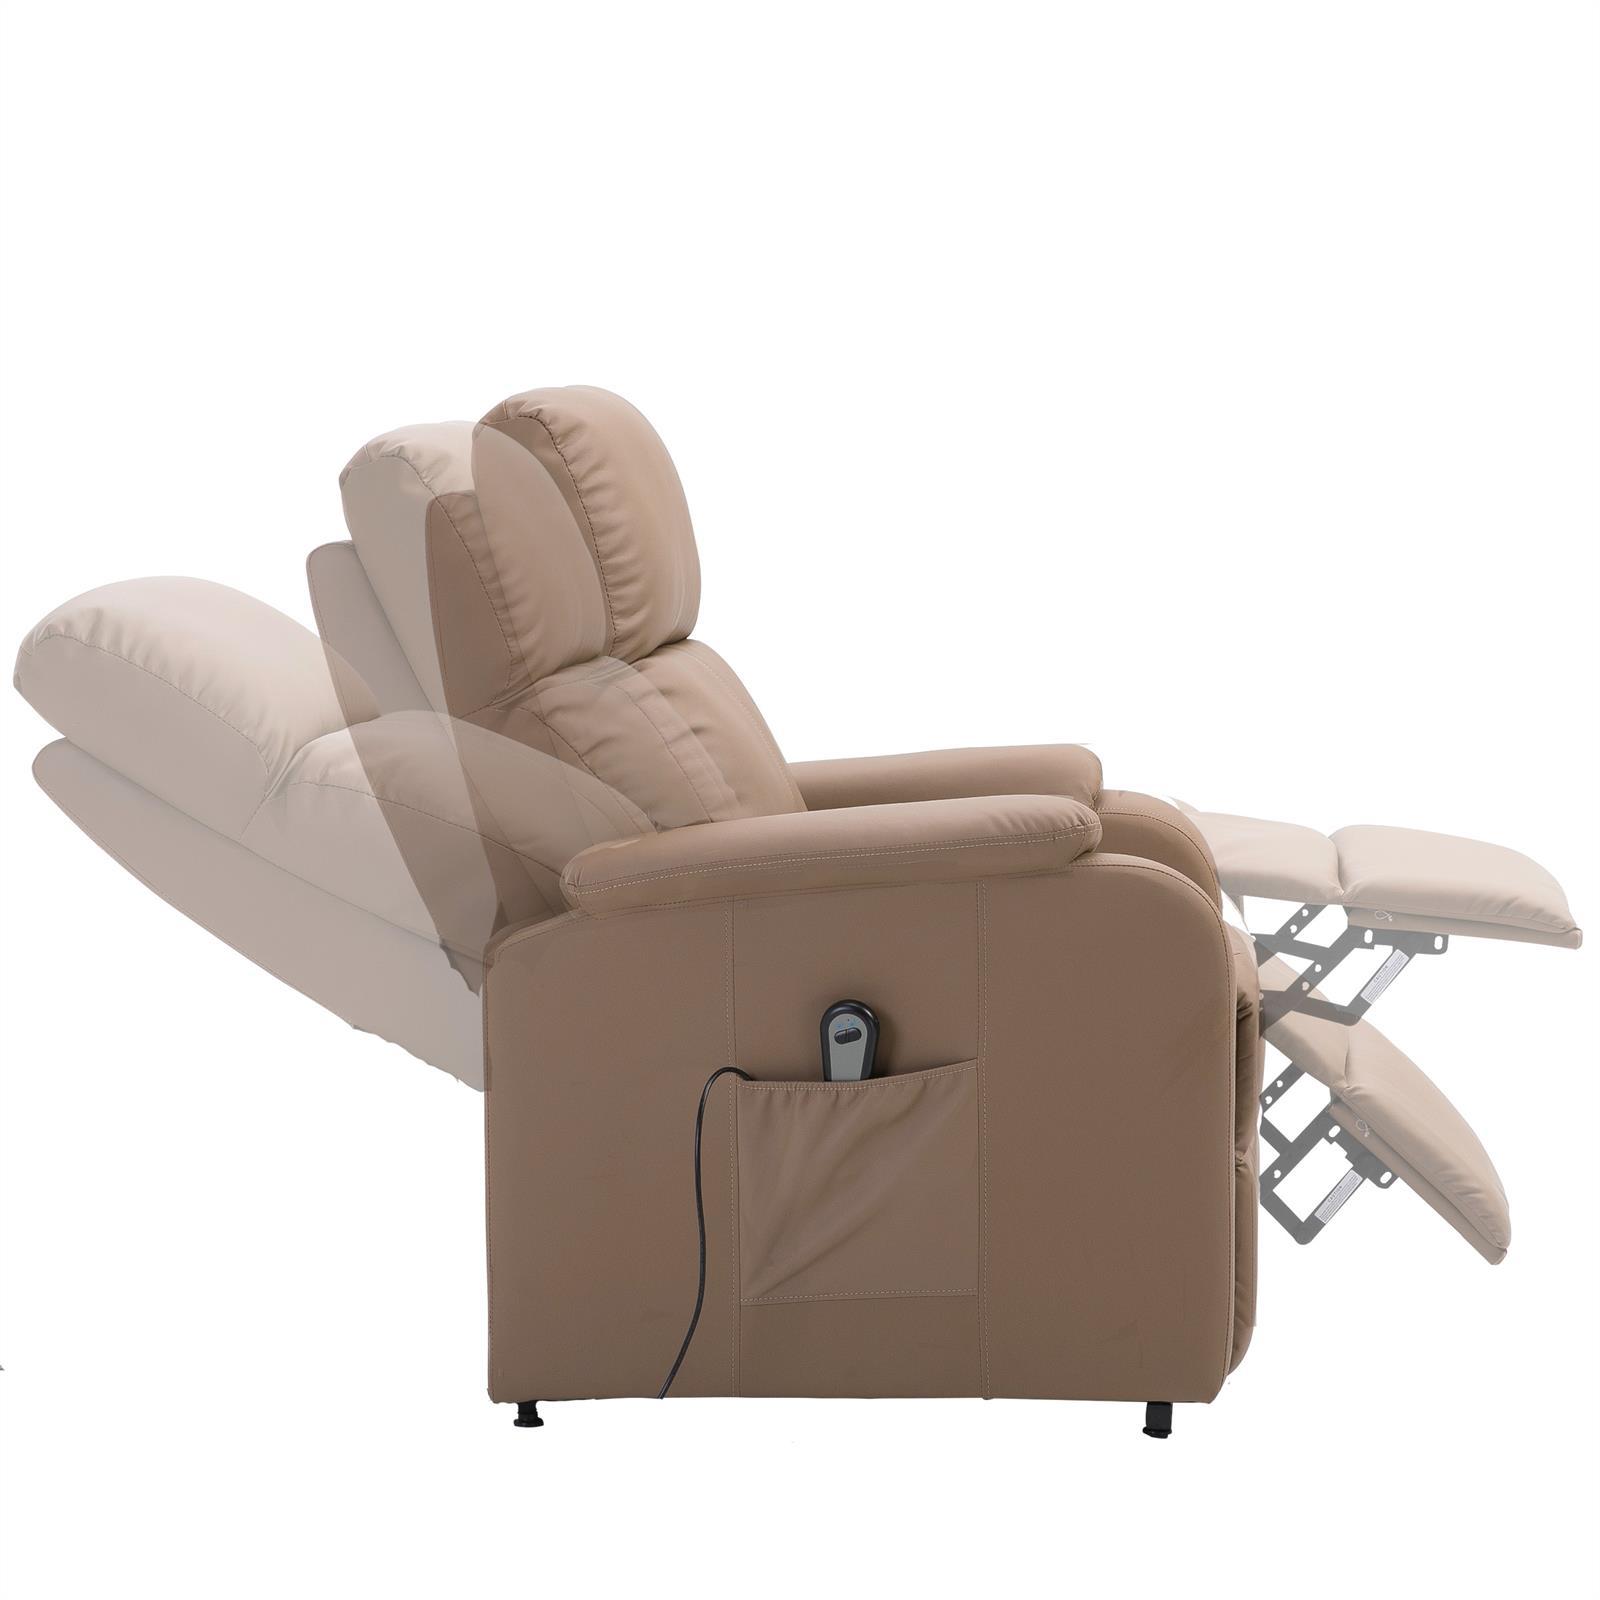 relaxsessel fernsehsessel tv ruhe sessel mit aufstehfunktion elektrisch ebay. Black Bedroom Furniture Sets. Home Design Ideas